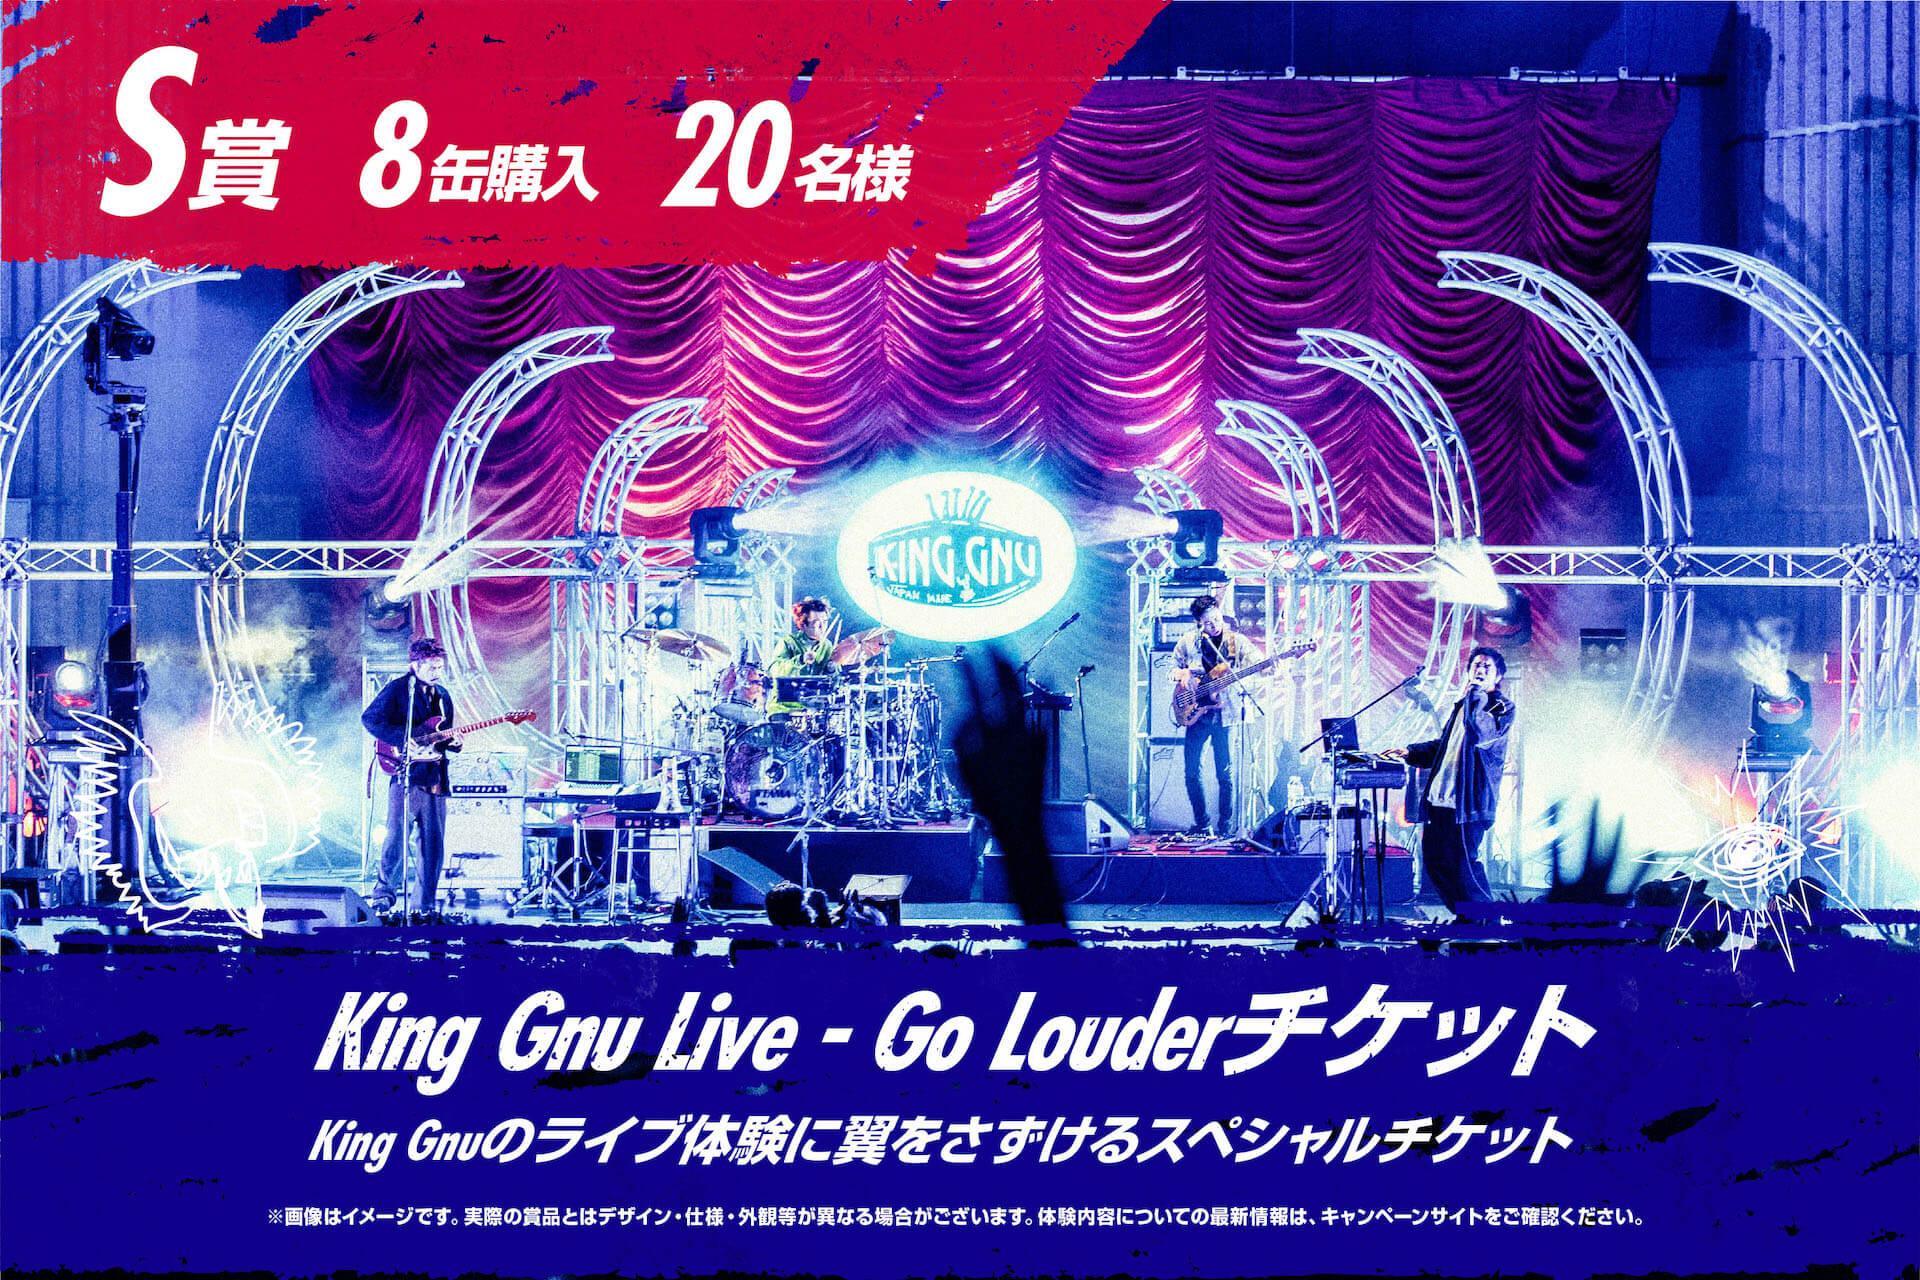 "King Gnuが日本アーティスト史上初めてRed Bullとパートナーシップを締結!""Go Louder""プロジェクトでインタビュー公開&コラボグッズプレゼントも music200908_kinggnu_redbull_5"